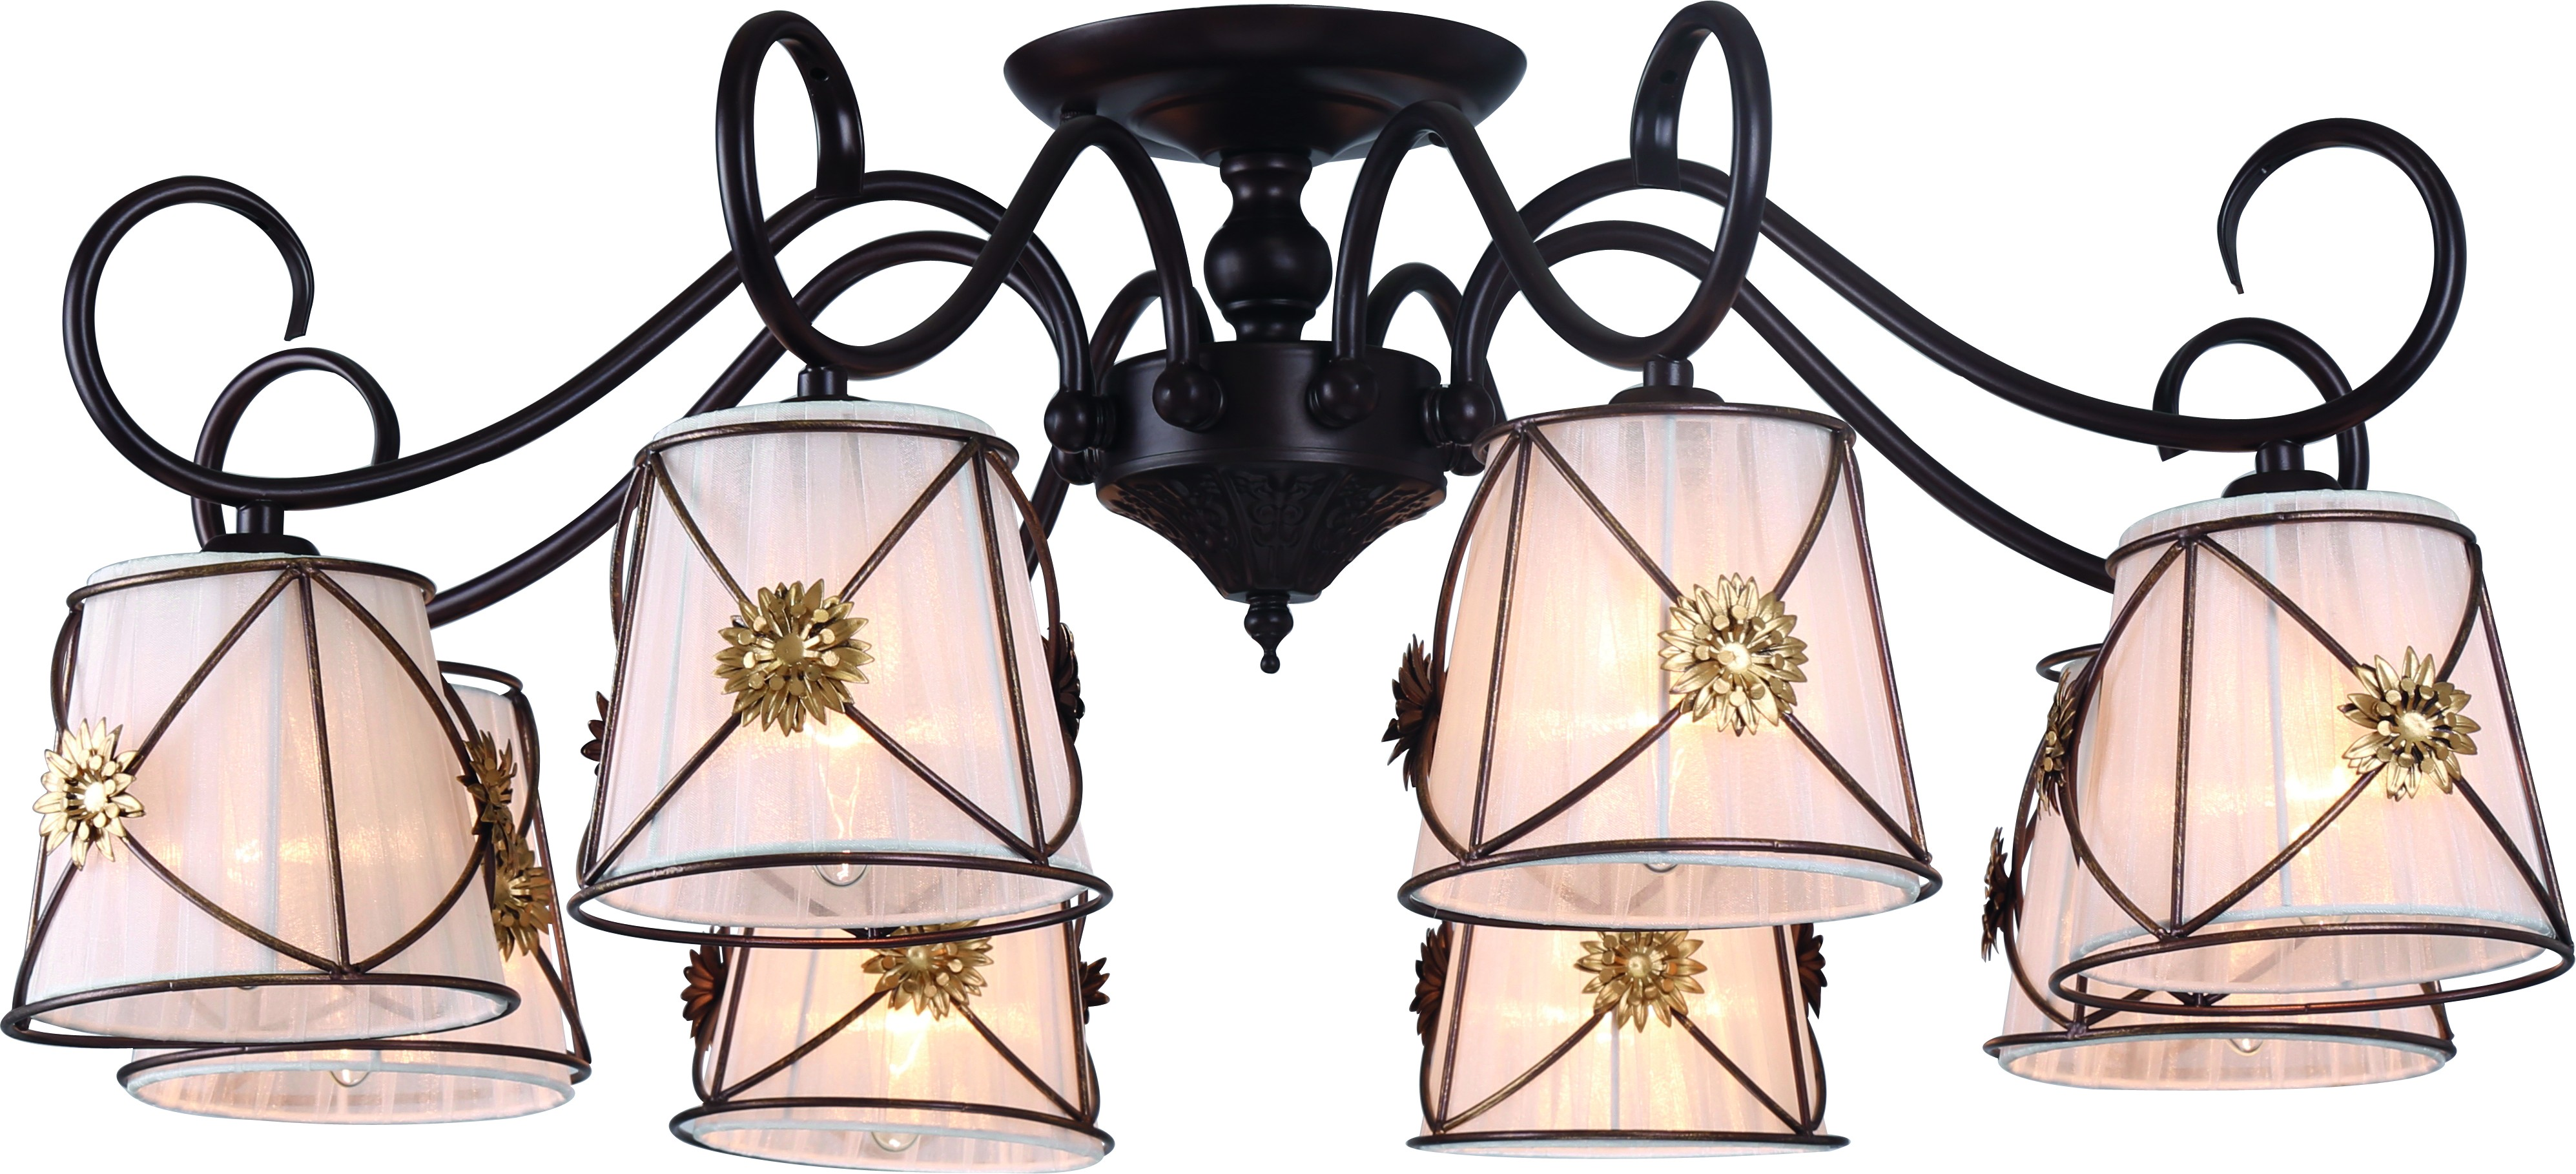 Люстра Arte lamp A5495pl-8br люстра на штанге arte lamp fortuna a5495pl 5br